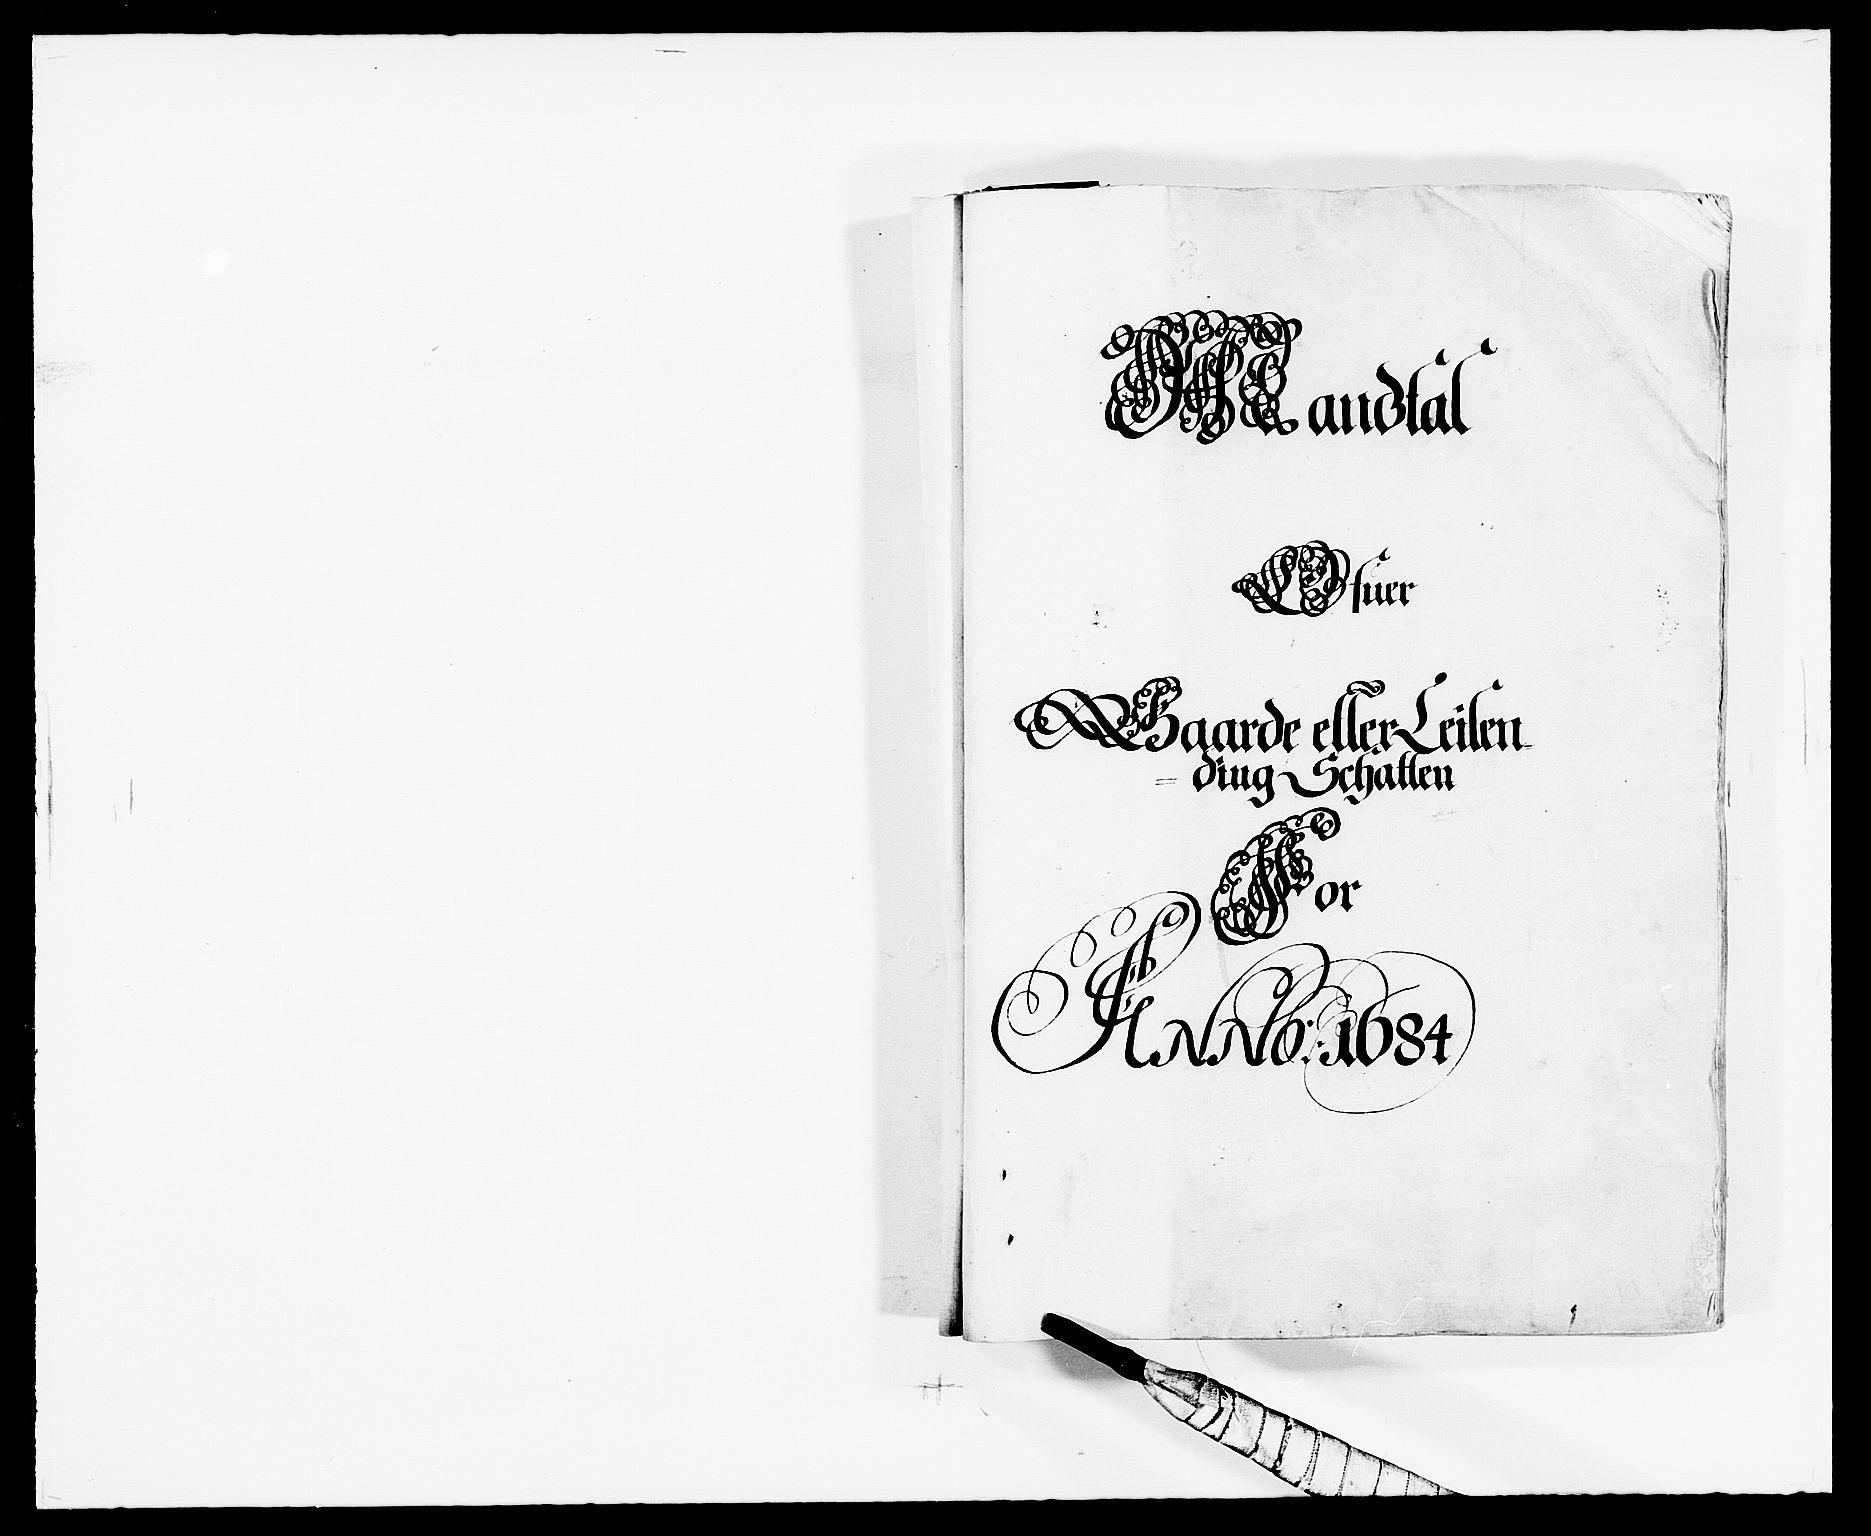 RA, Rentekammeret inntil 1814, Reviderte regnskaper, Fogderegnskap, R32/L1854: Fogderegnskap Jarlsberg grevskap, 1684, s. 10